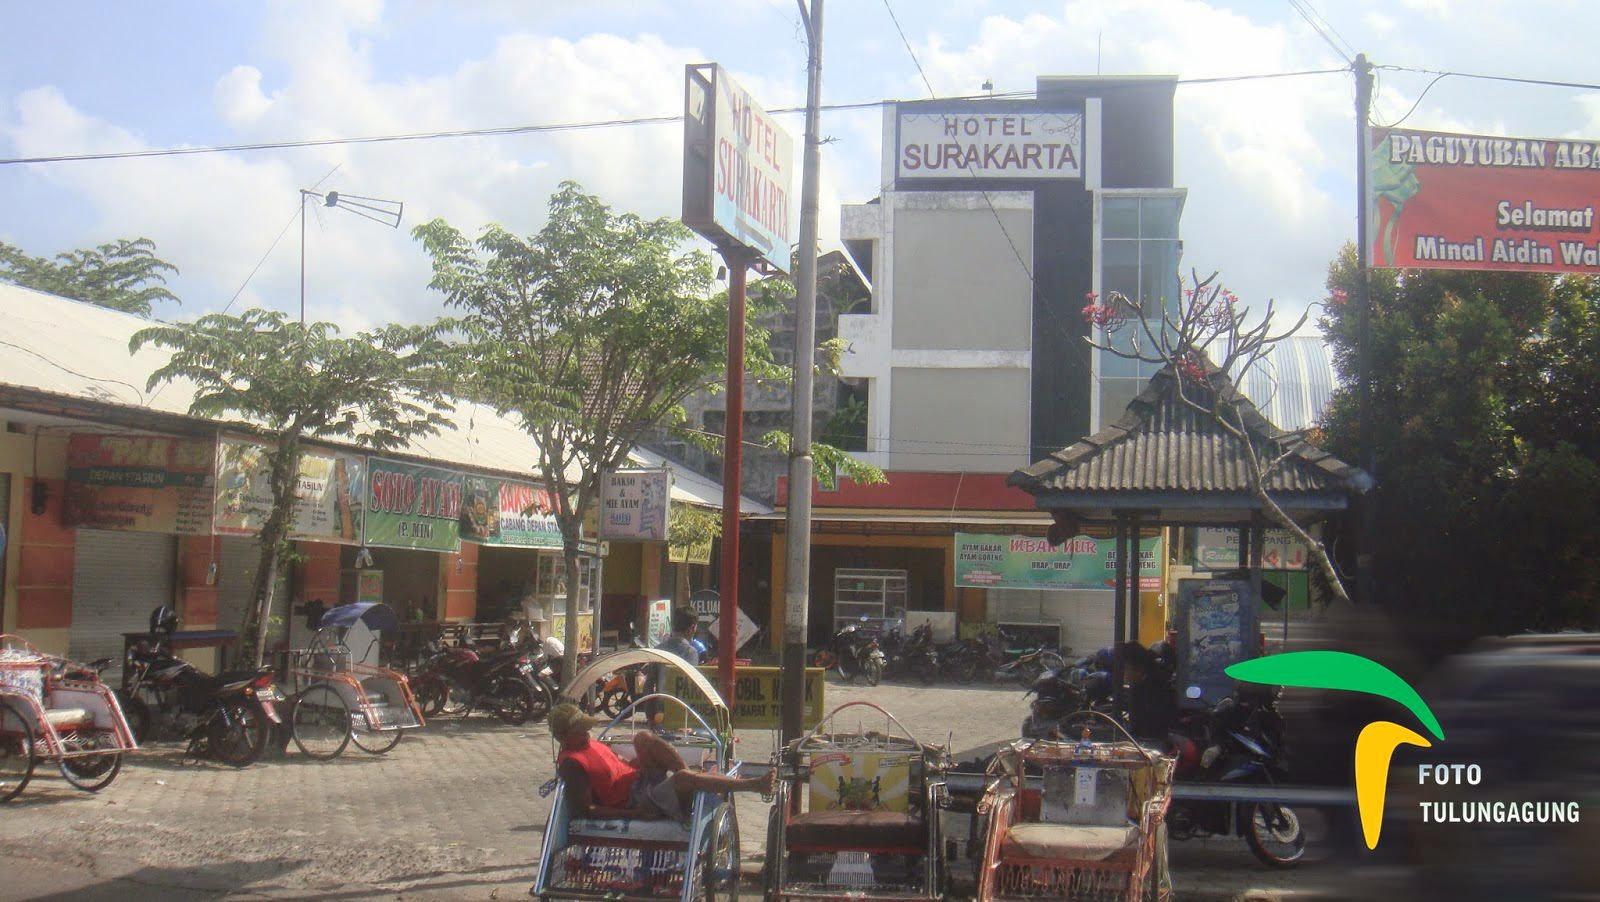 Hotel Surakarta Di Tulungagung